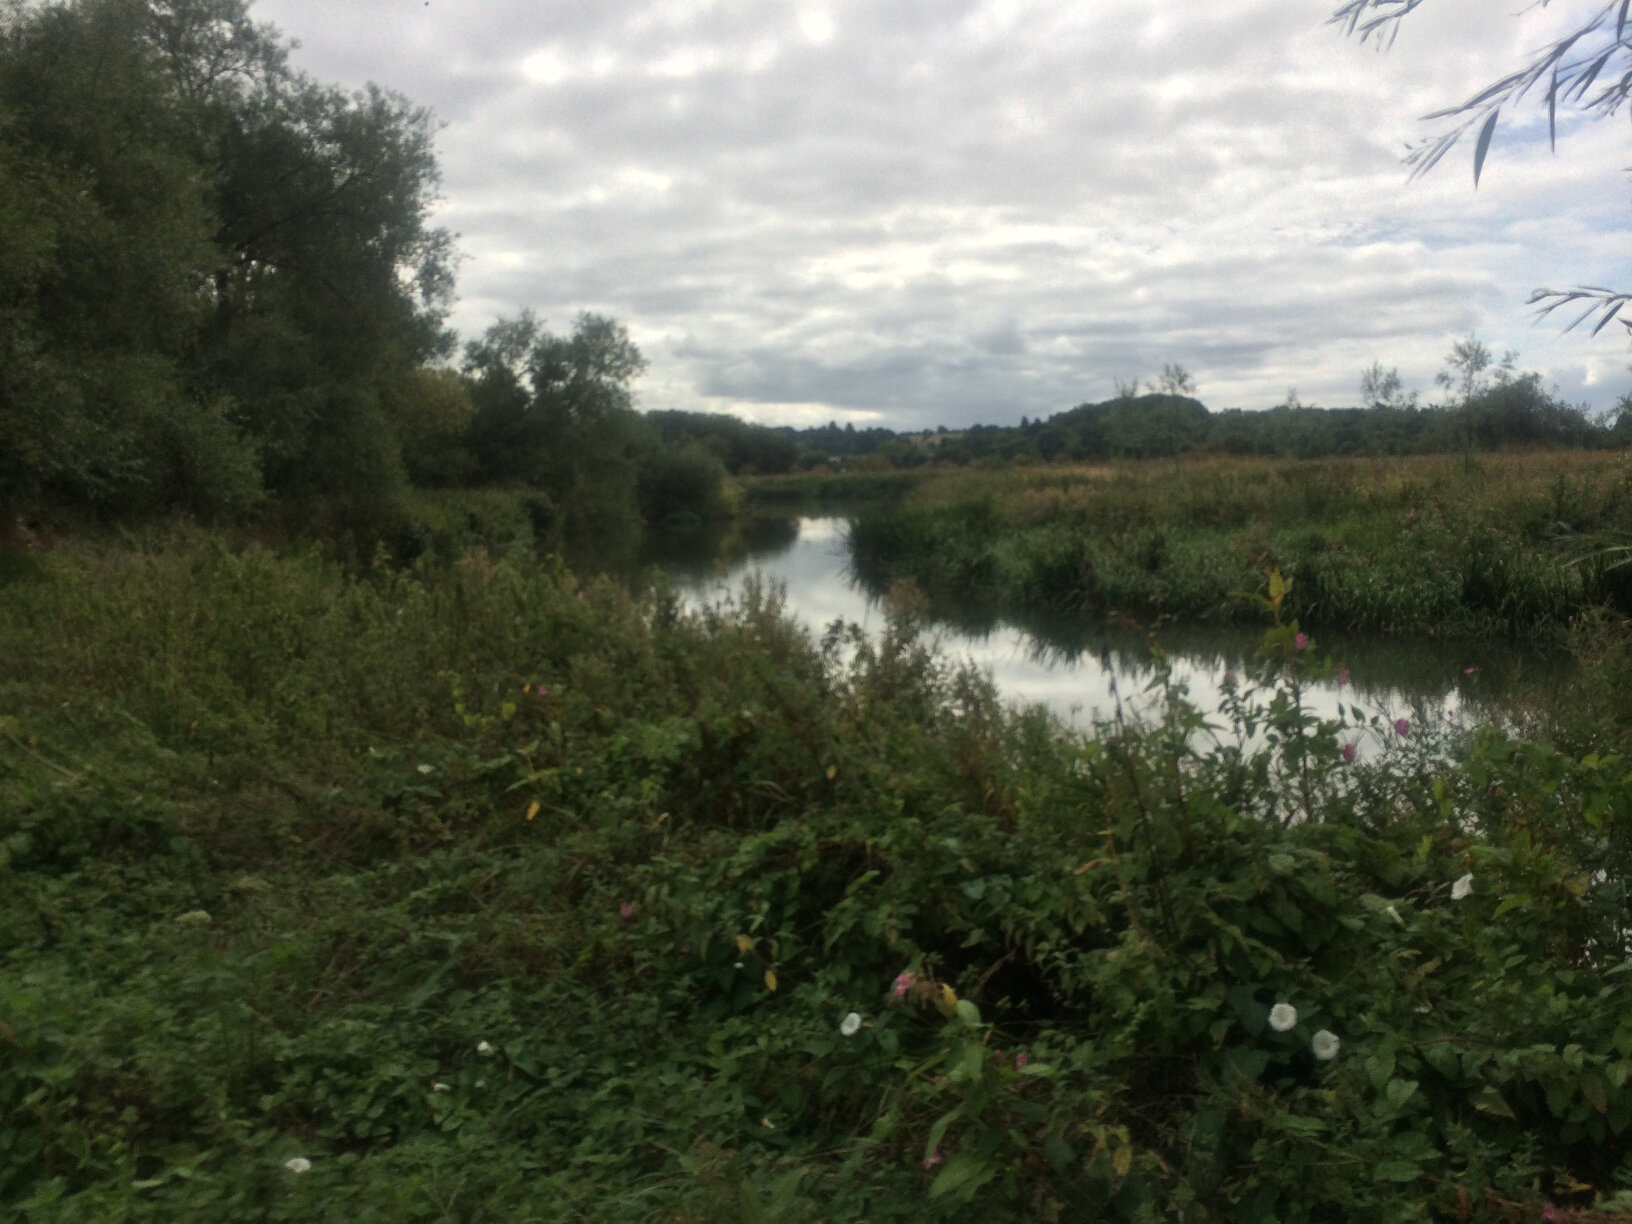 From Lechlade to Newbridge (48)